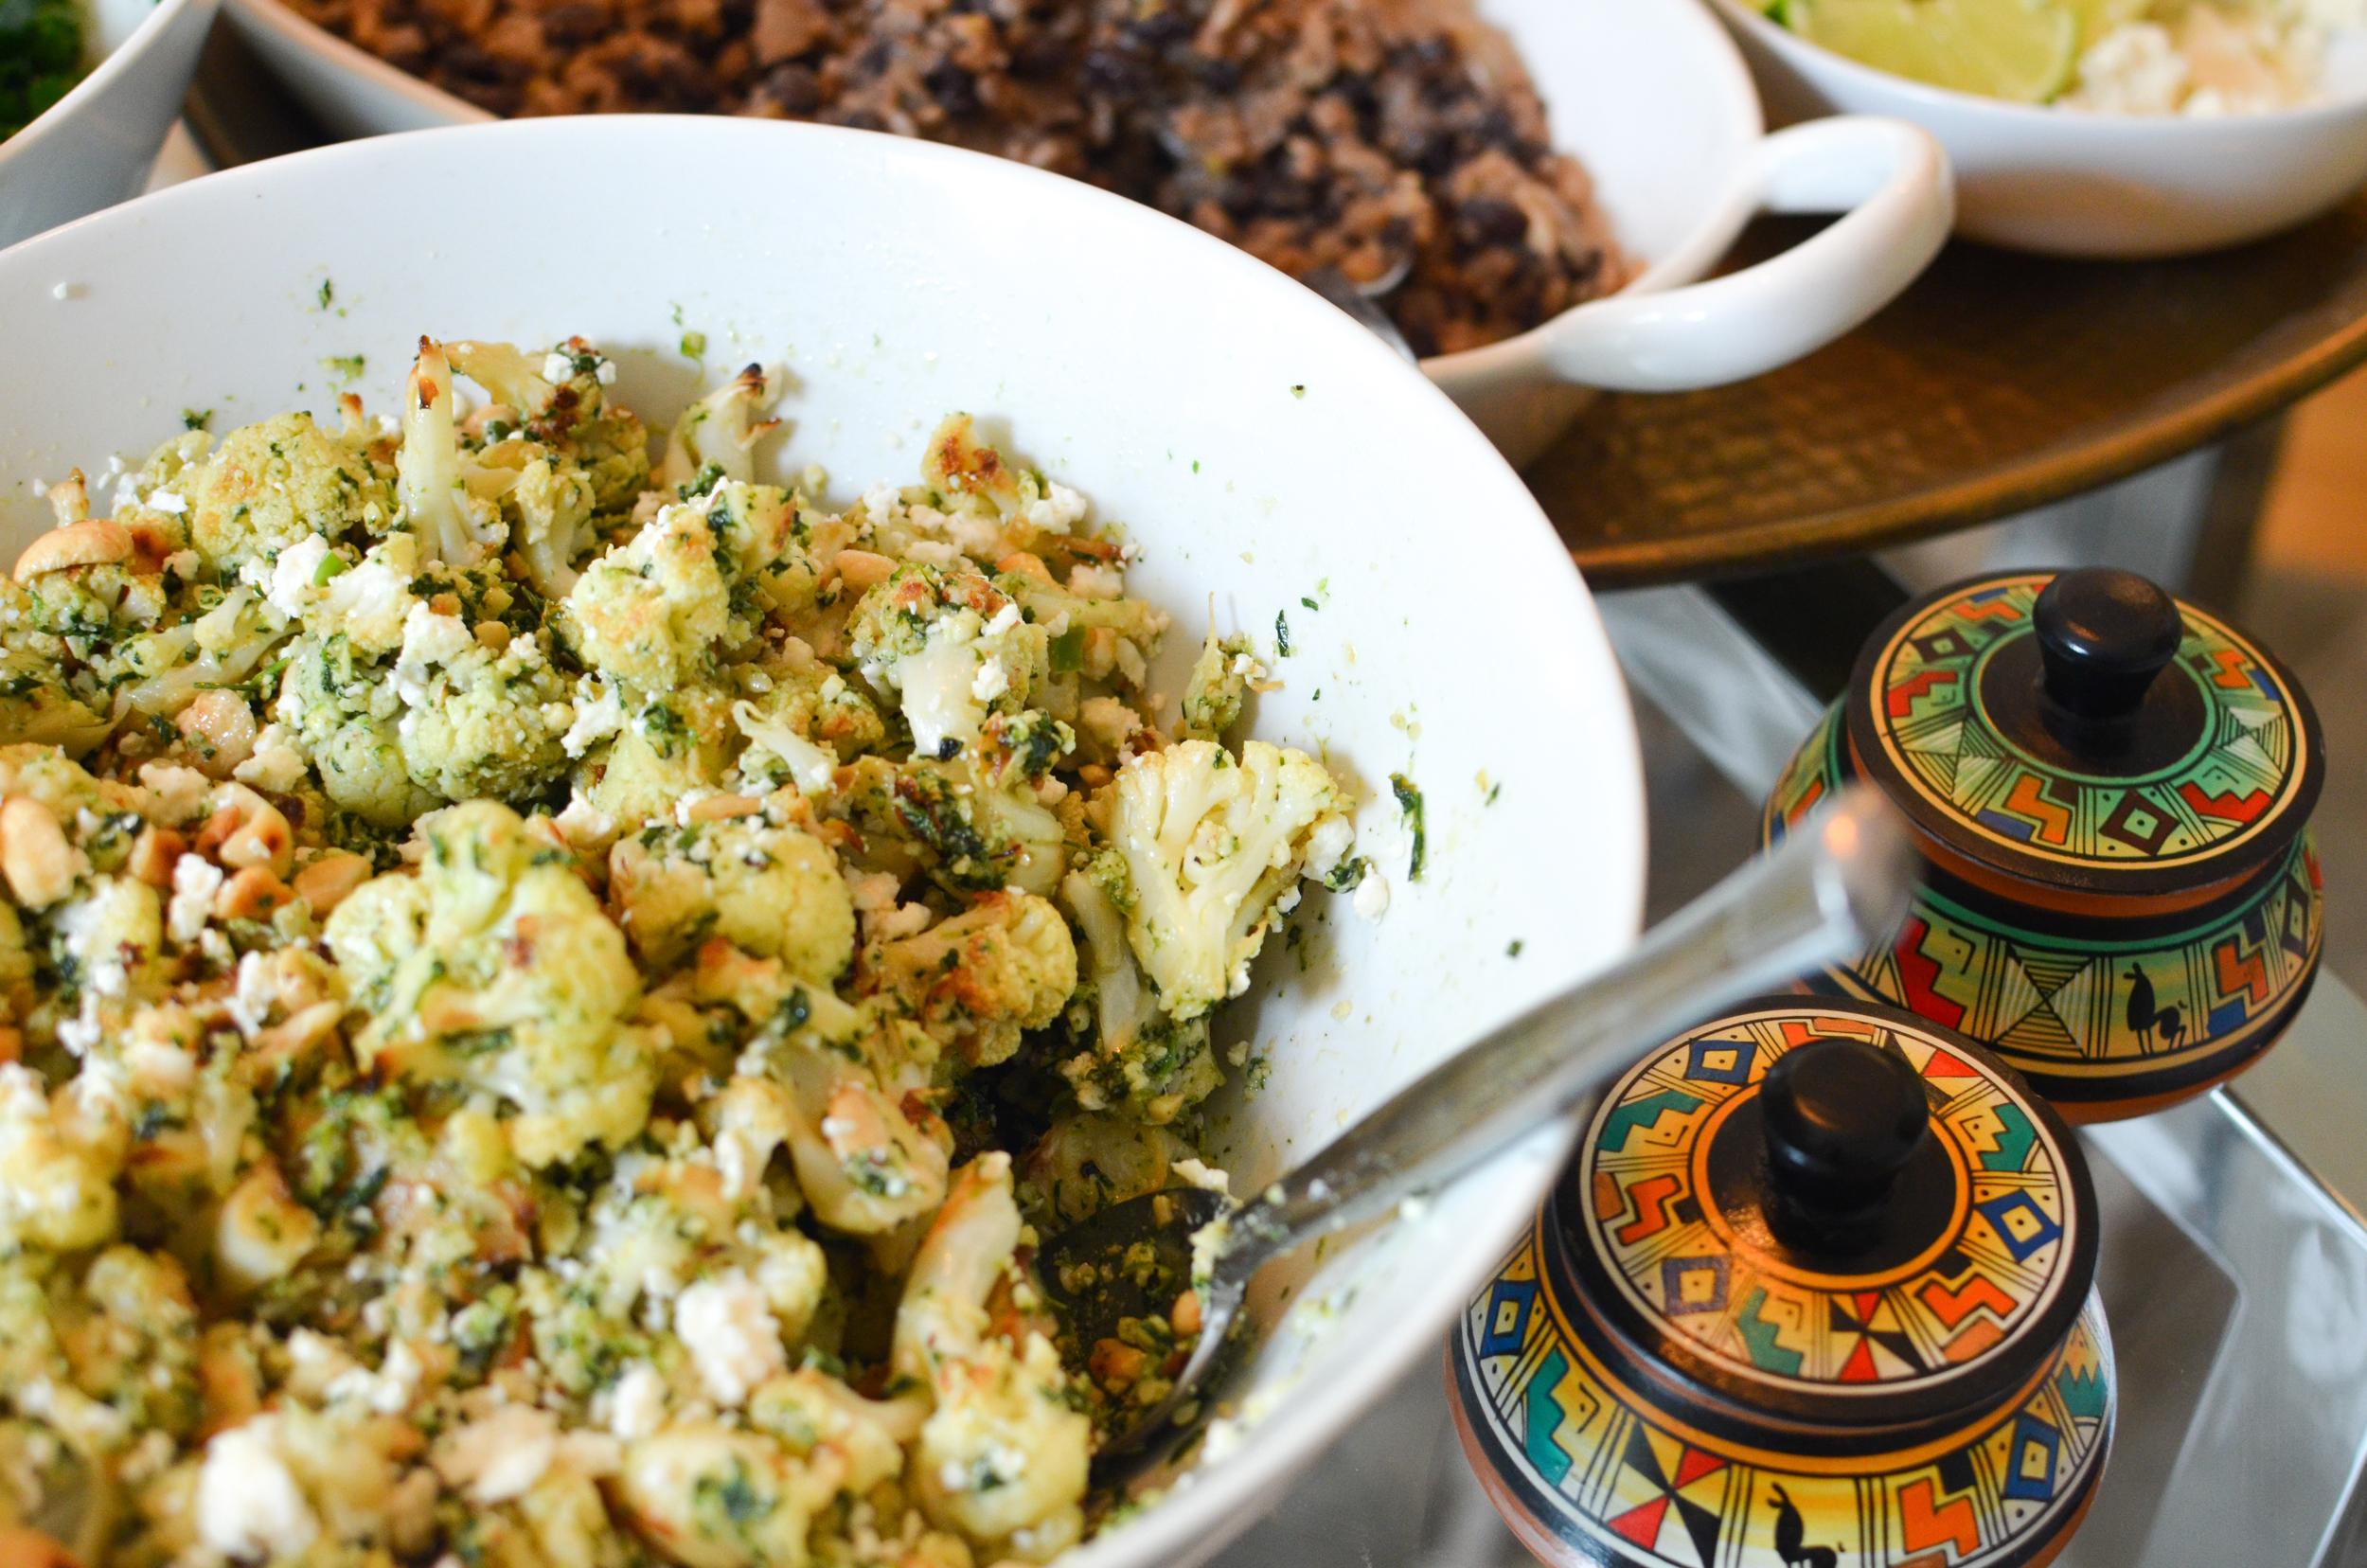 cc IATG - Cauliflower pesto (1 of 1).jpg